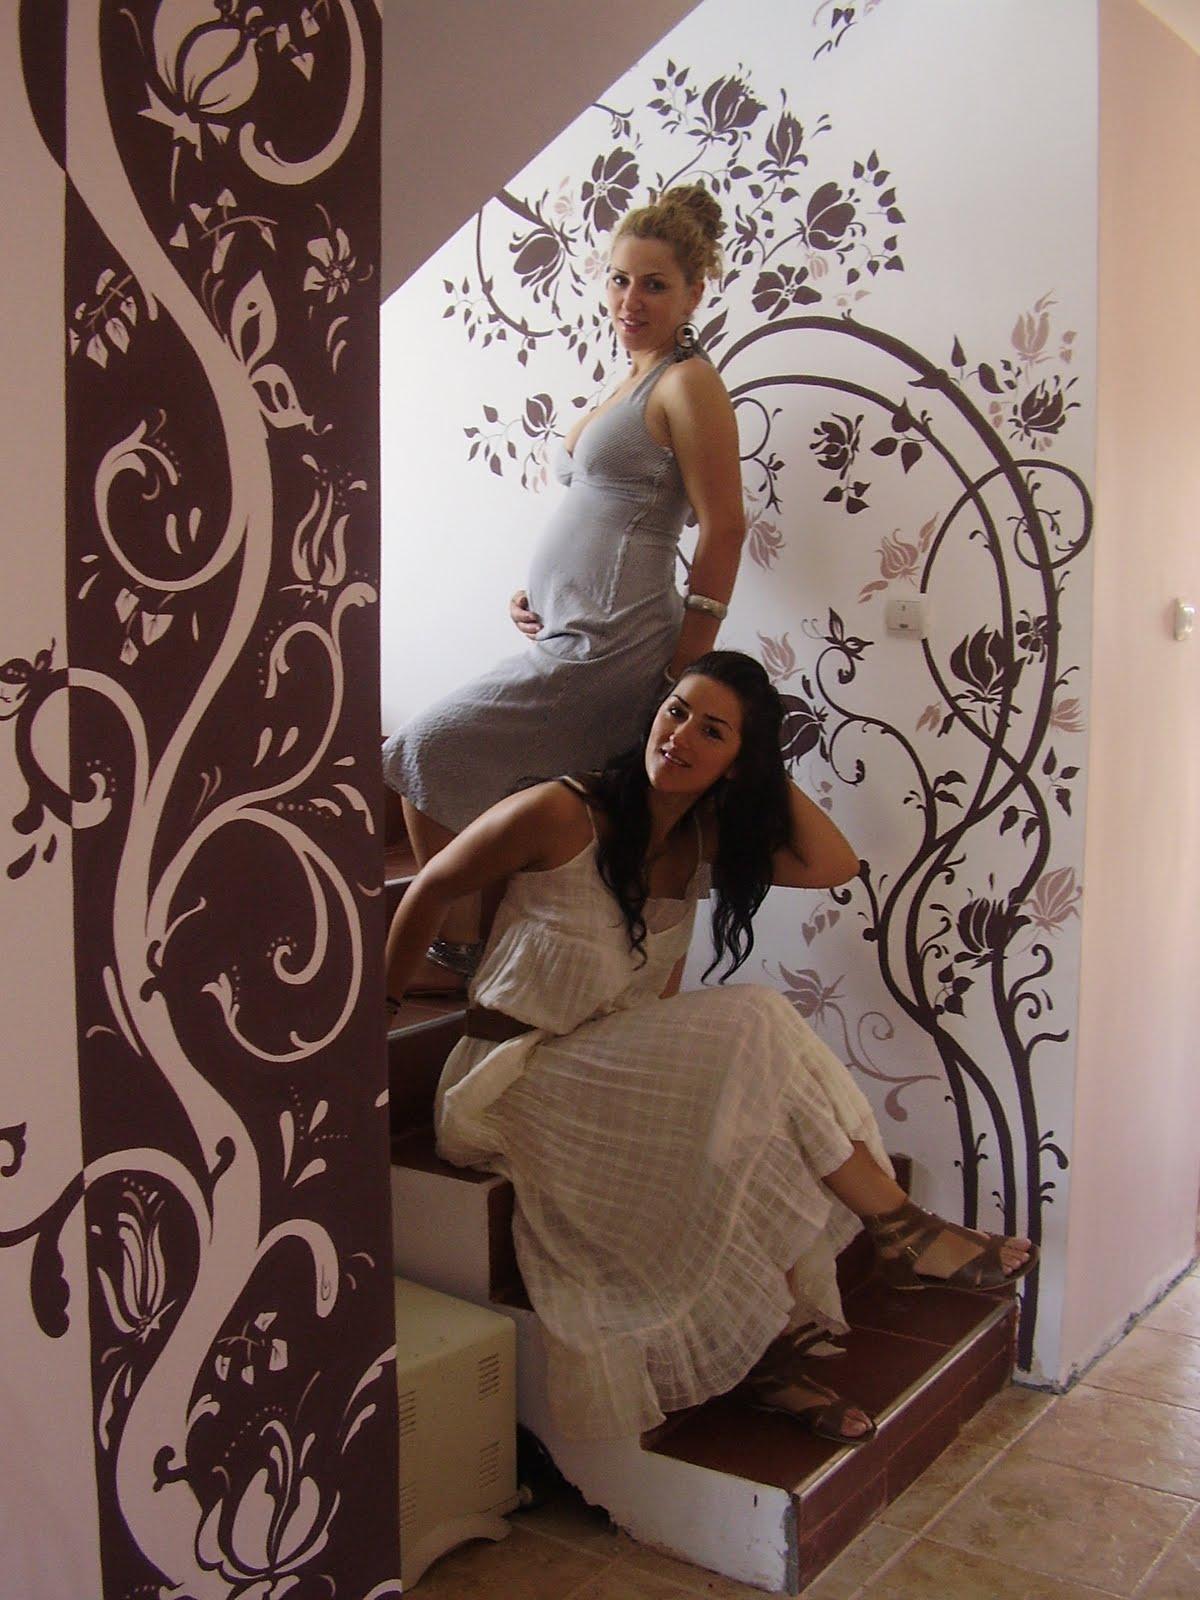 Carmen stefan mi casa decoracion pintura mural for Definicion de pintura mural